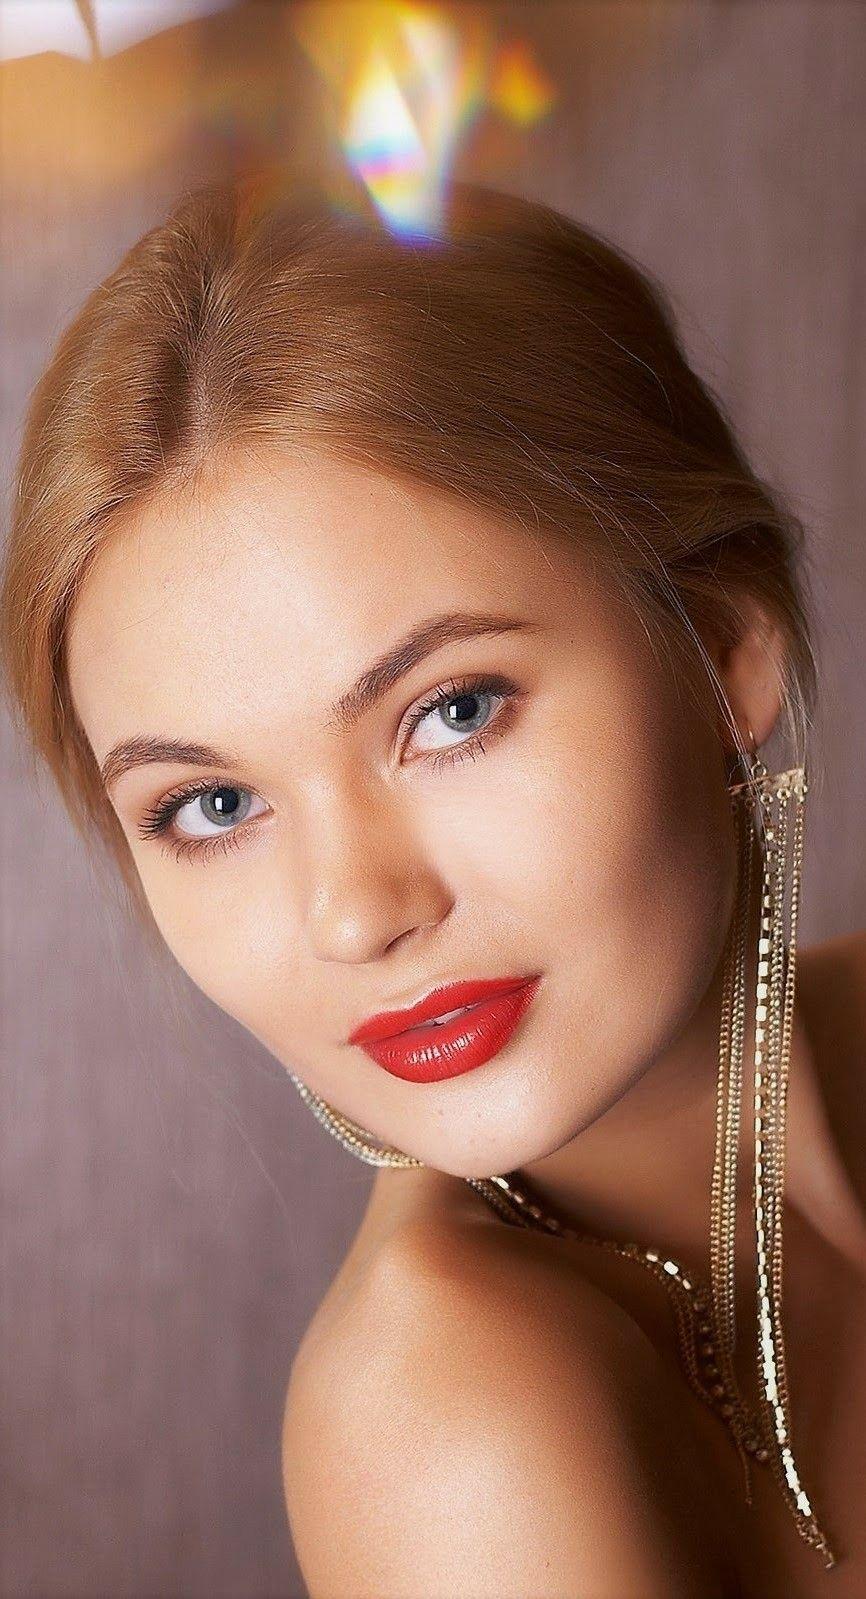 Pin By Ramji Sabhaya On Cute Face Beauty Blonde Redhead Cute Faces